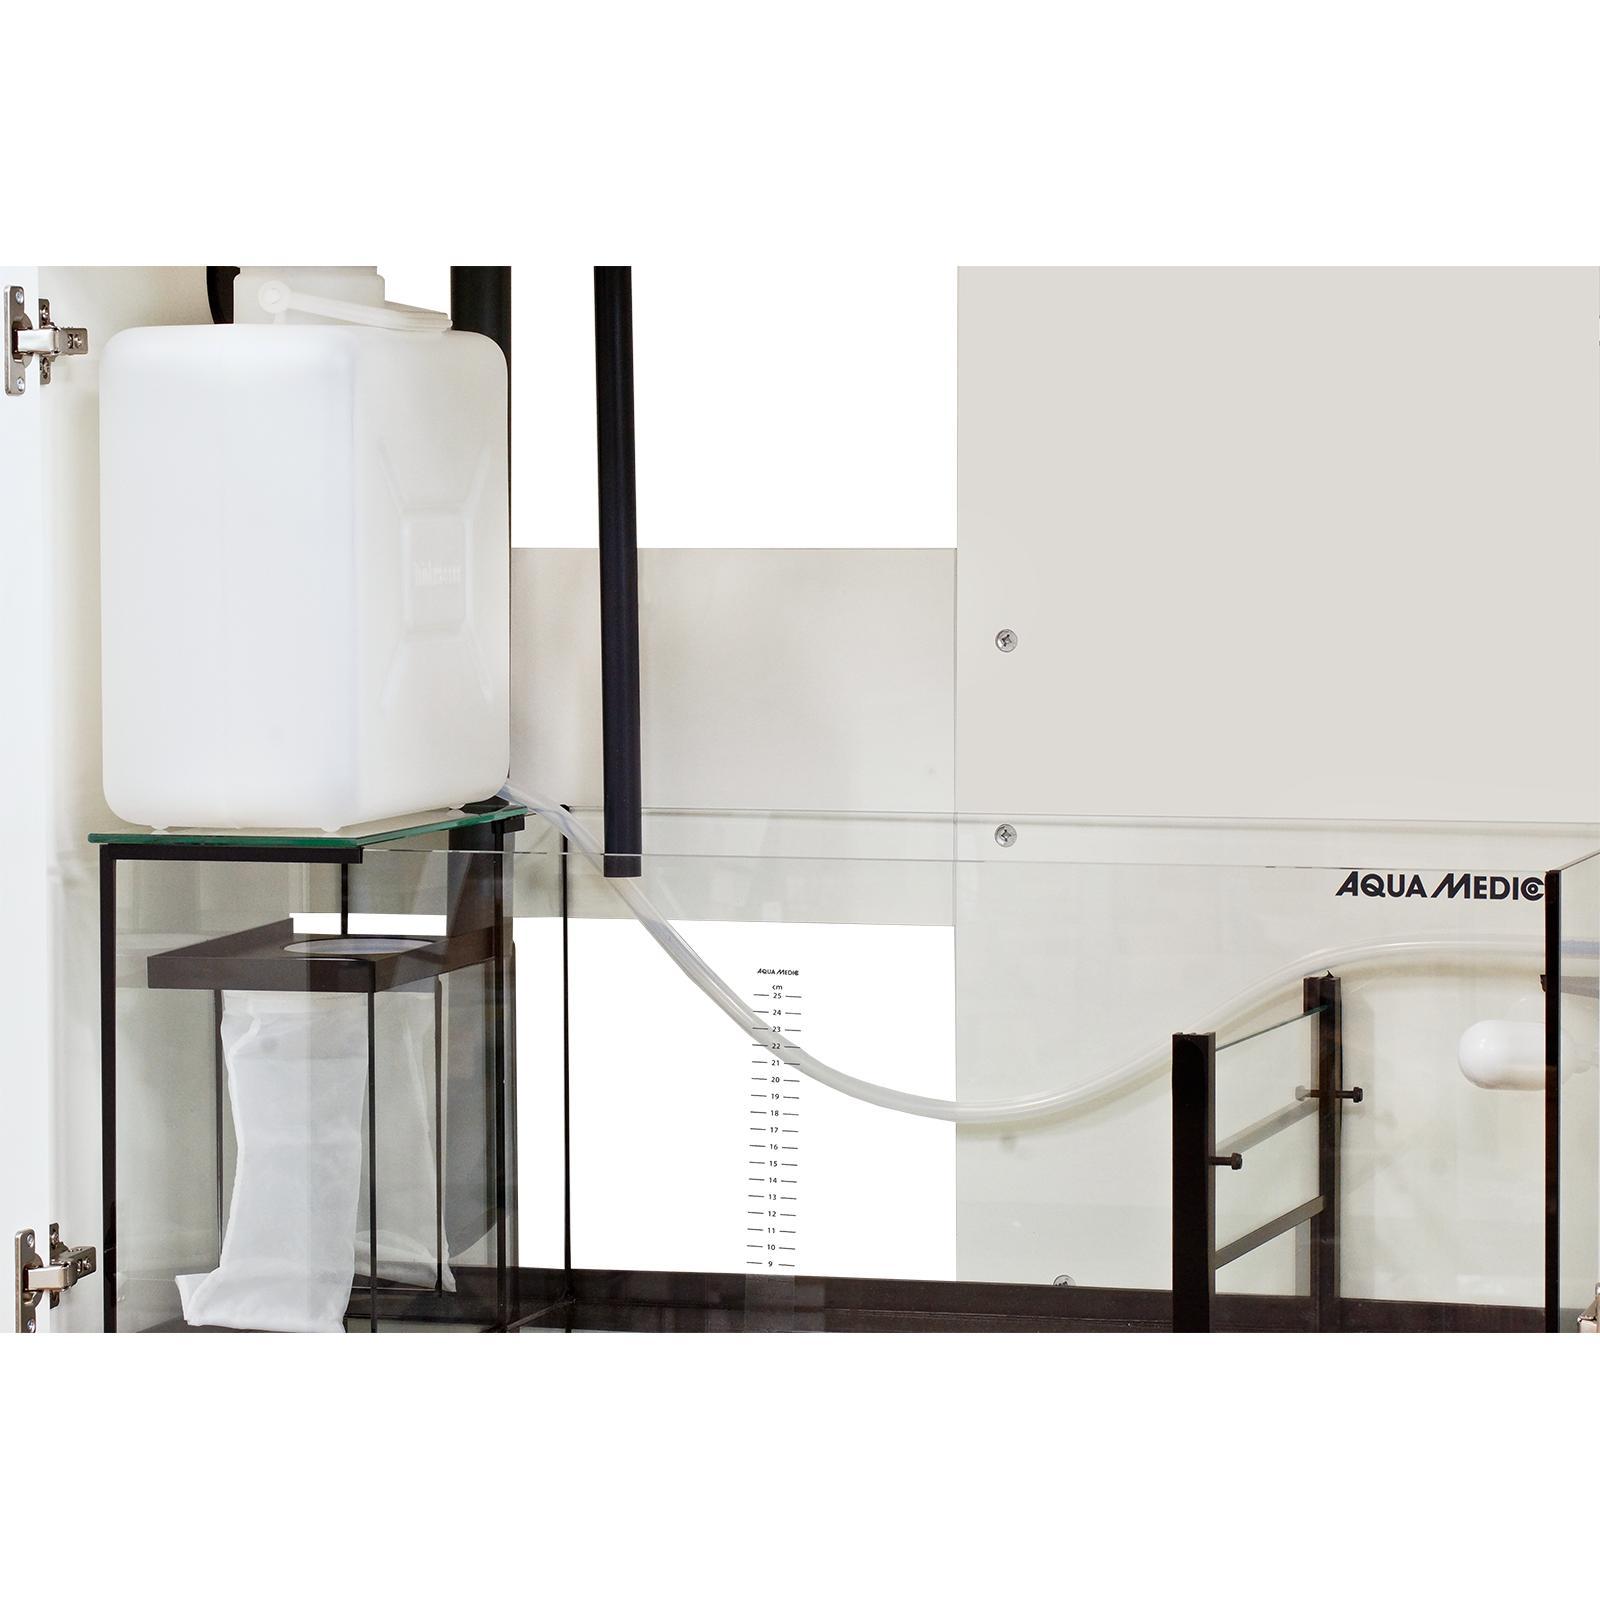 Aqua Medic Armatus 450 weiß